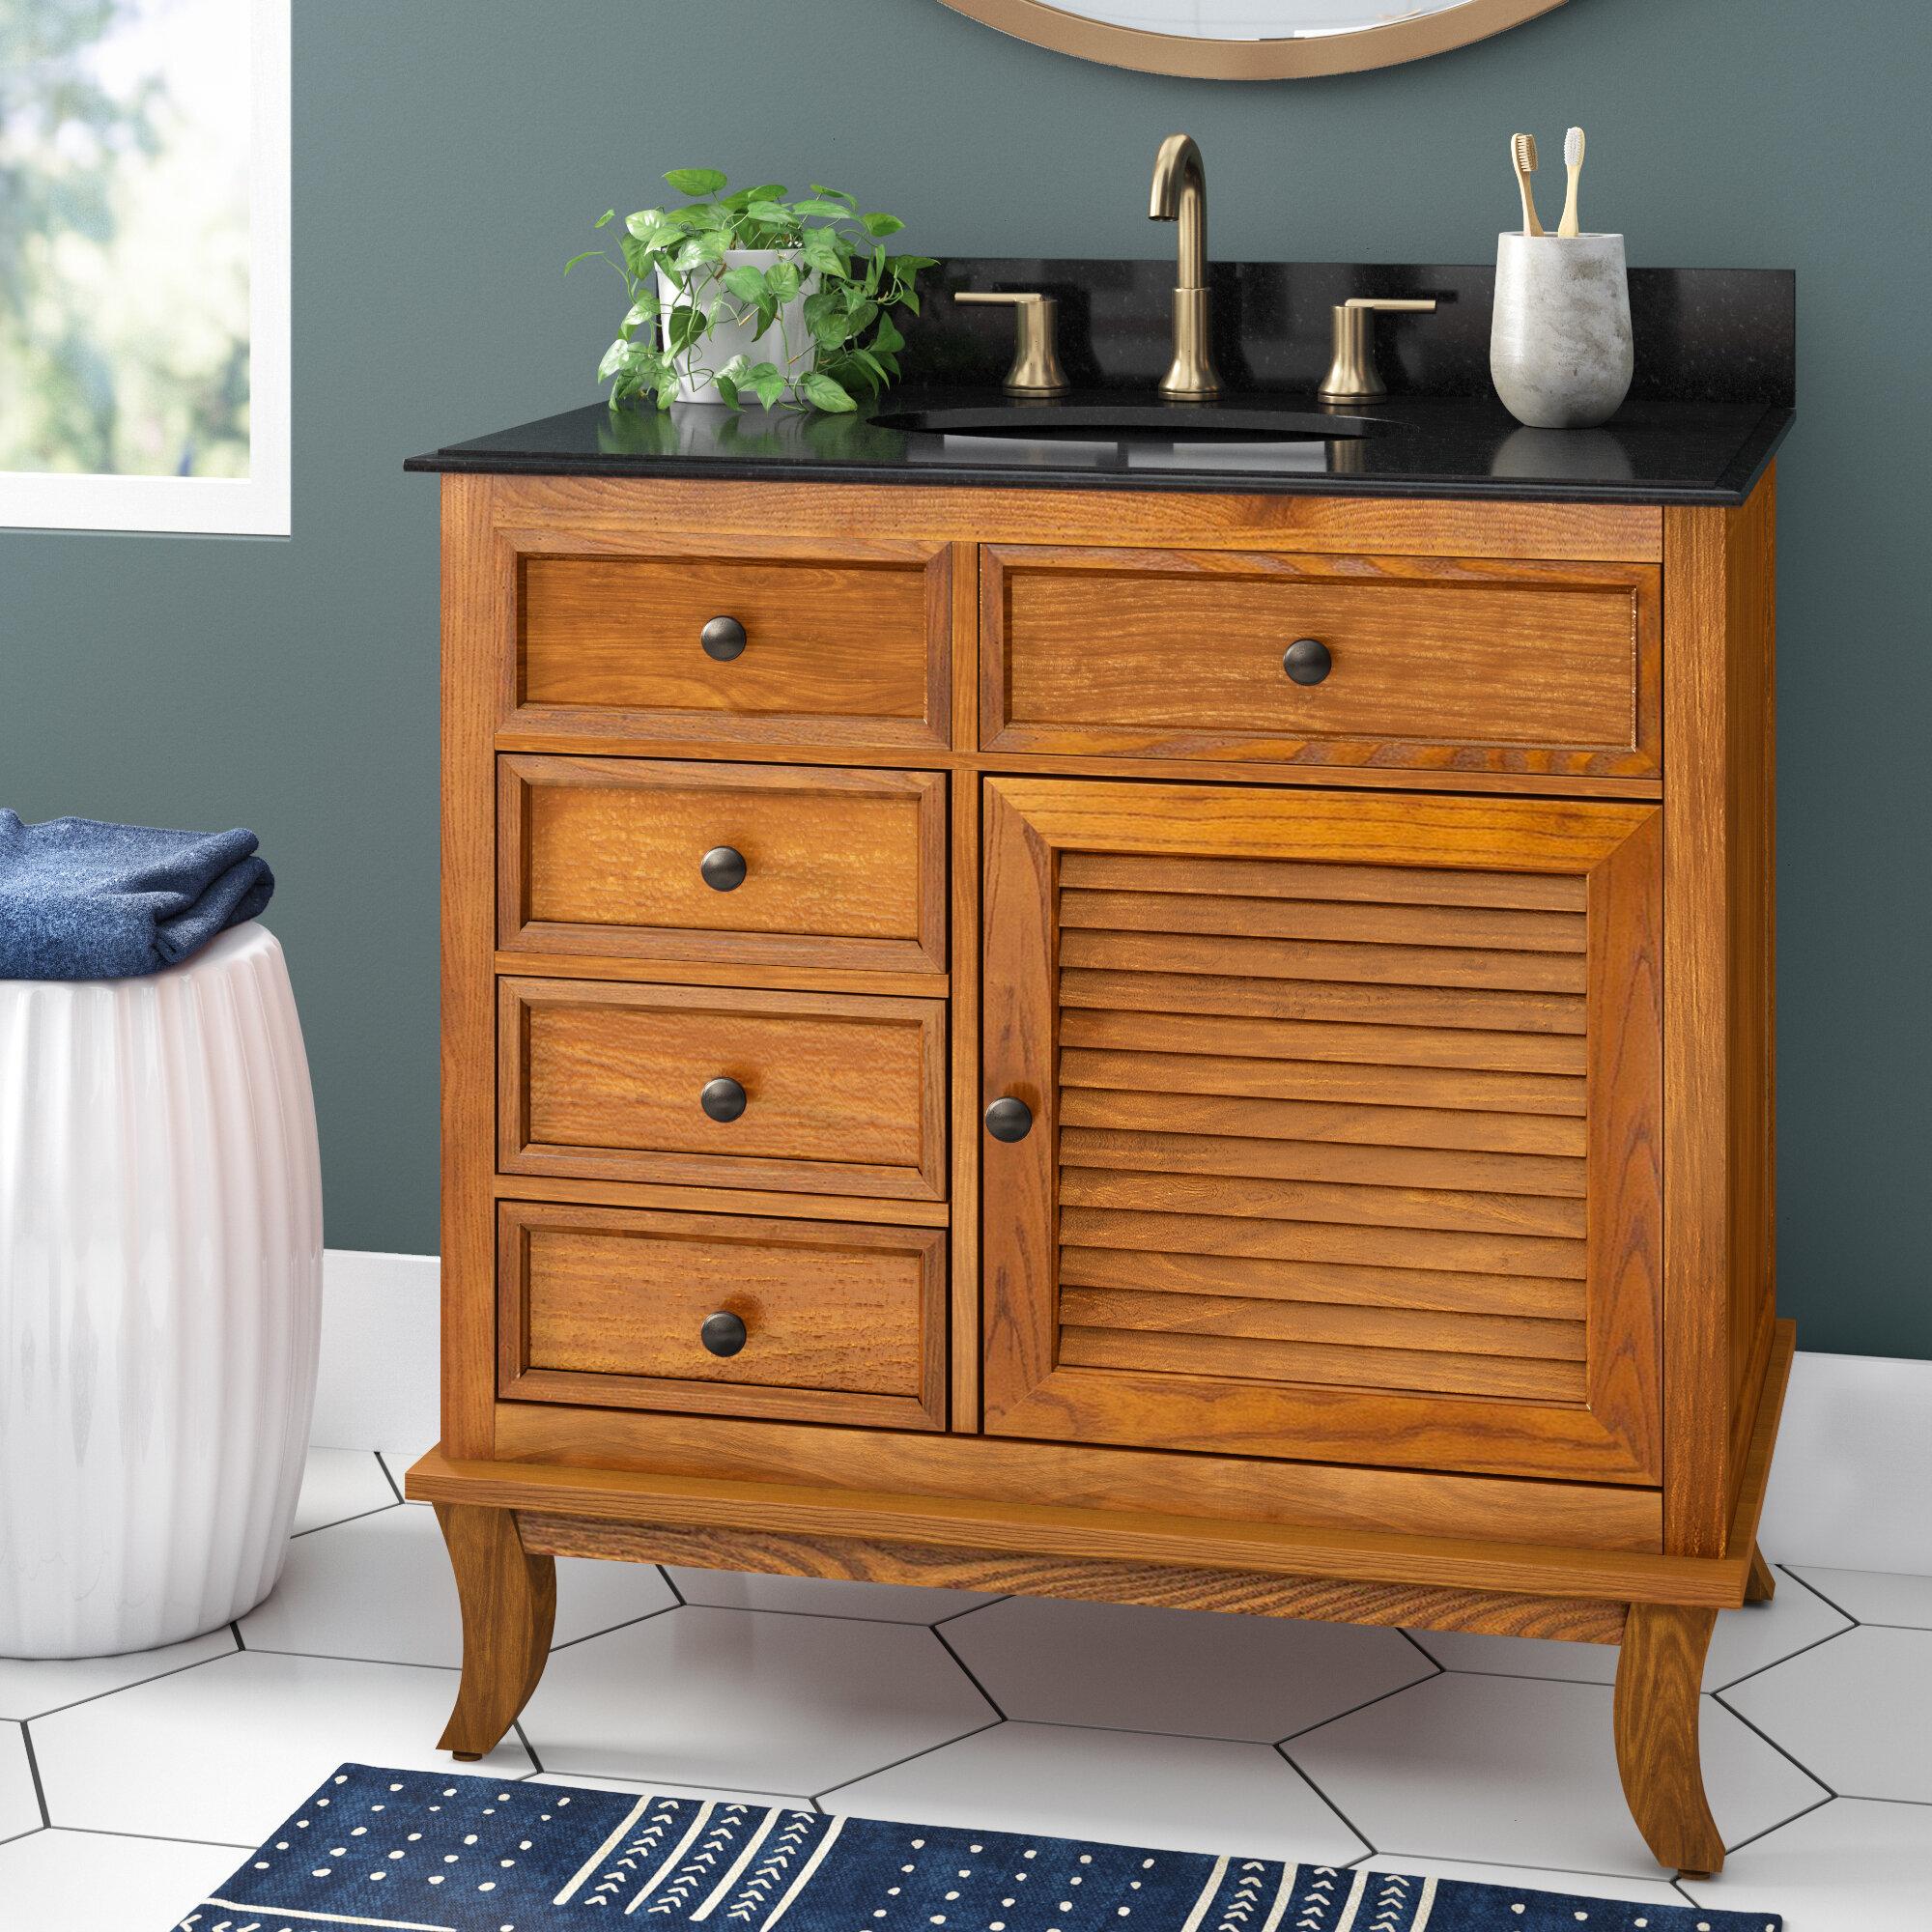 Adamski 34 Single Bathroom Vanity Set Reviews Joss Main